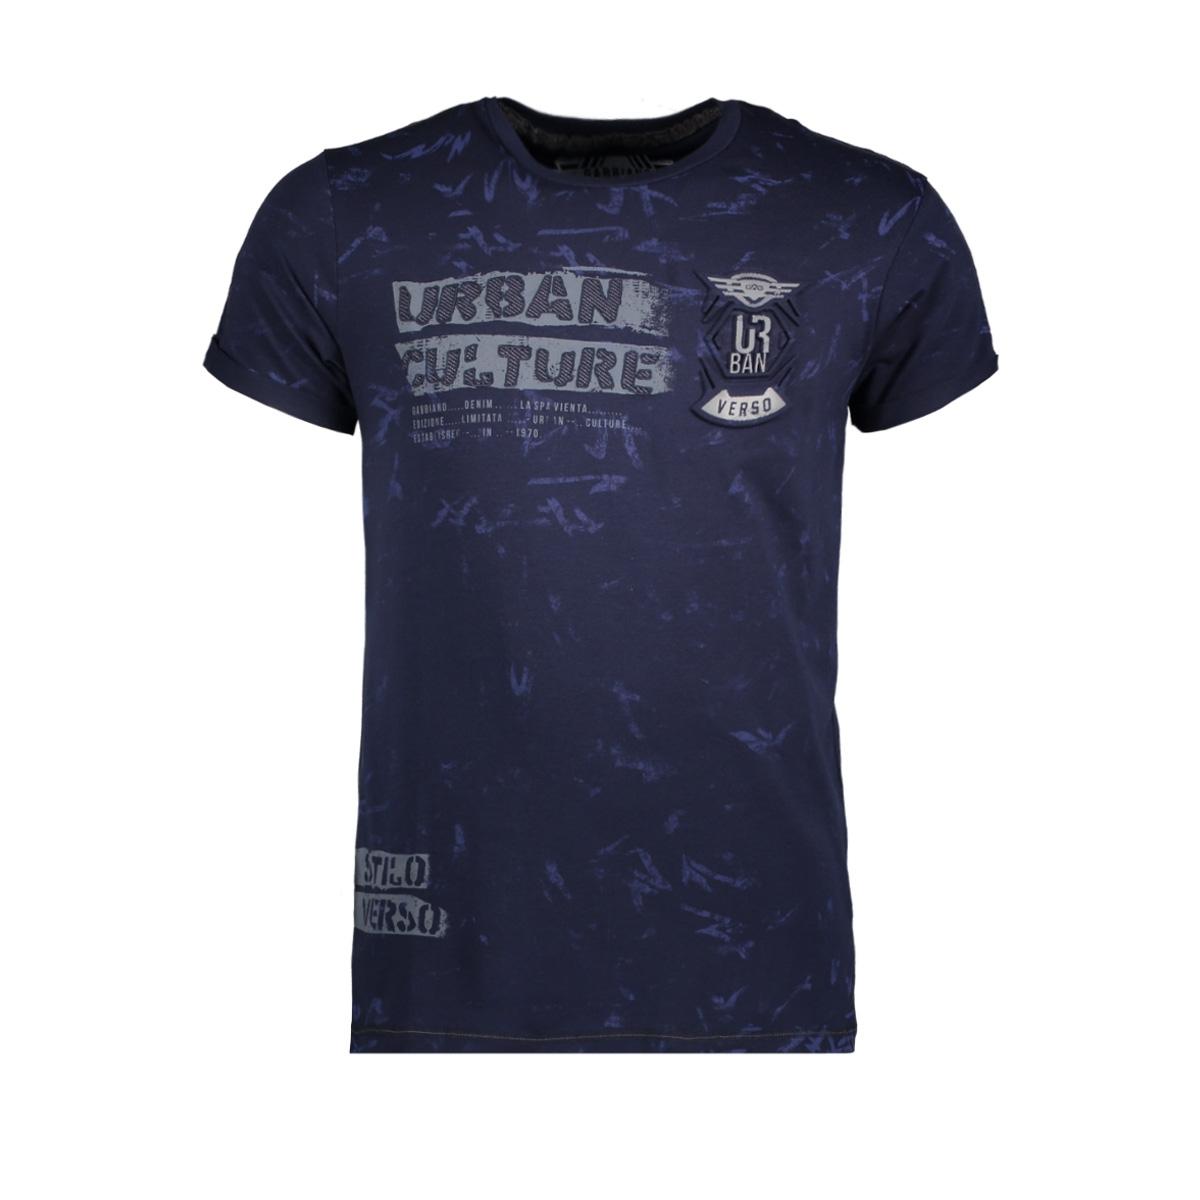 13885 gabbiano t-shirt navy